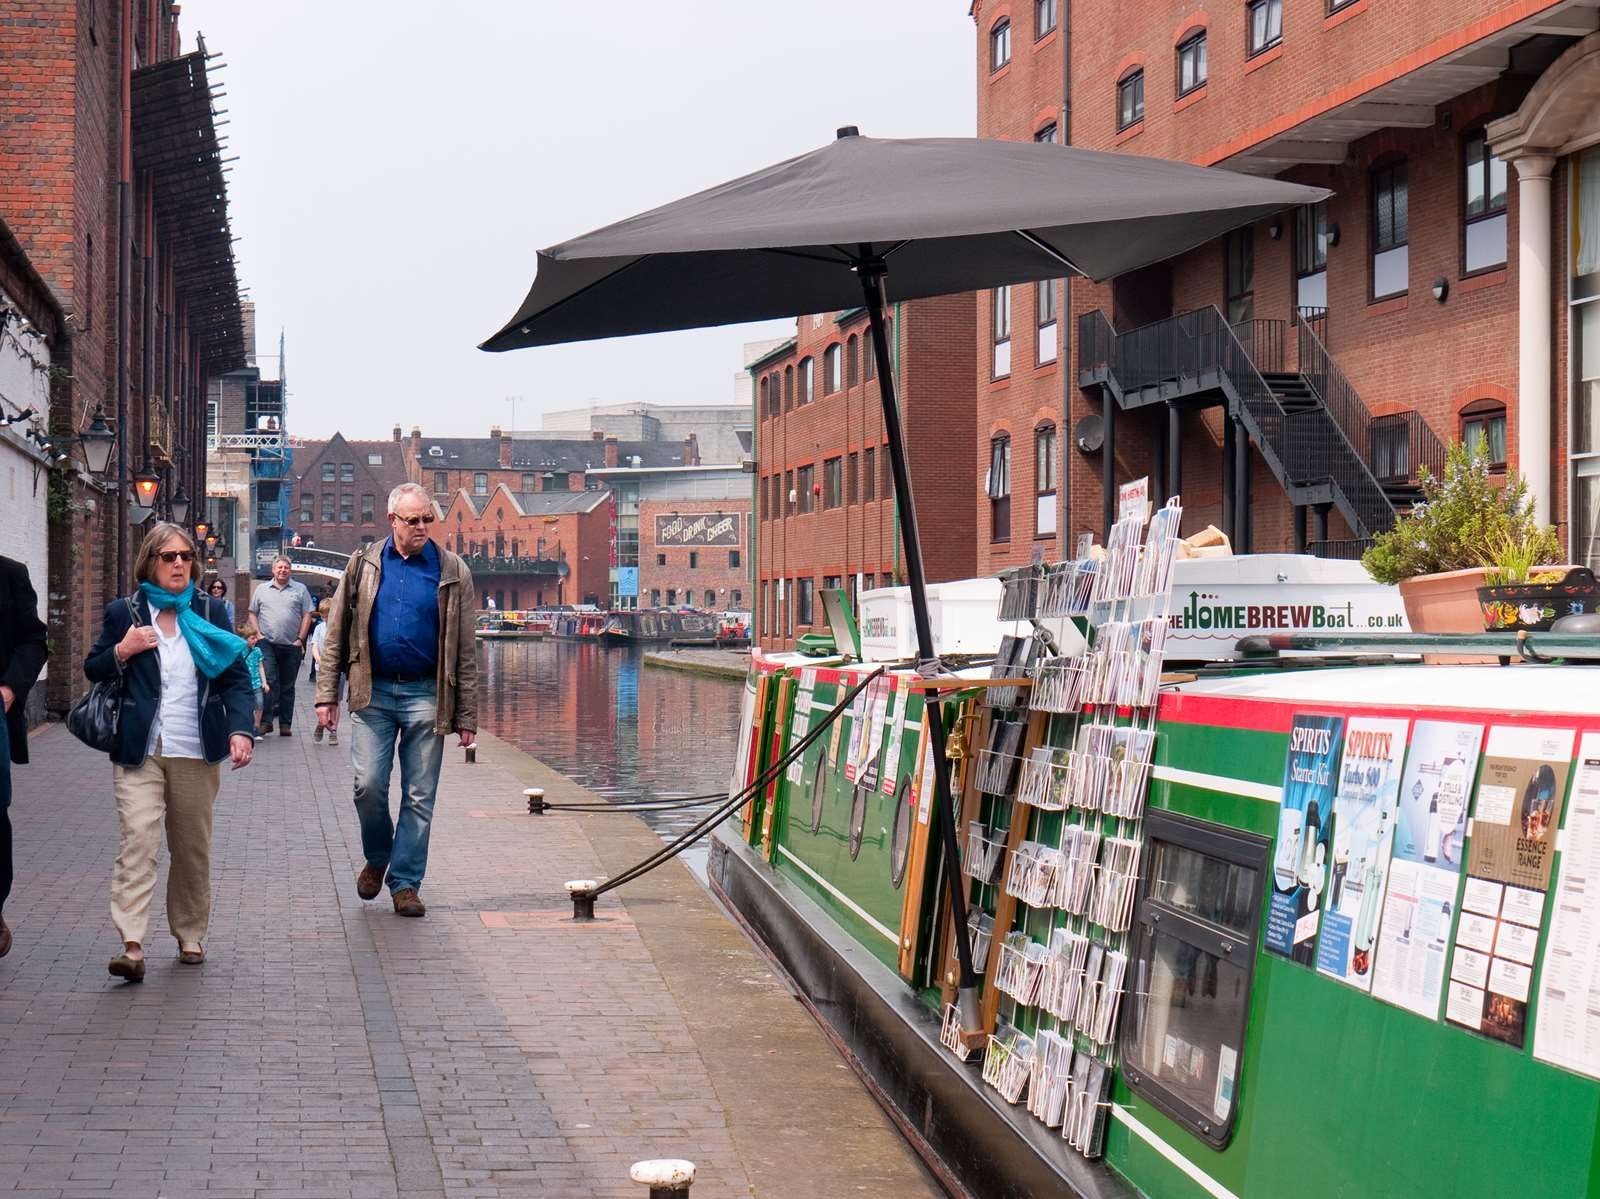 Blindly Place, Birmingham